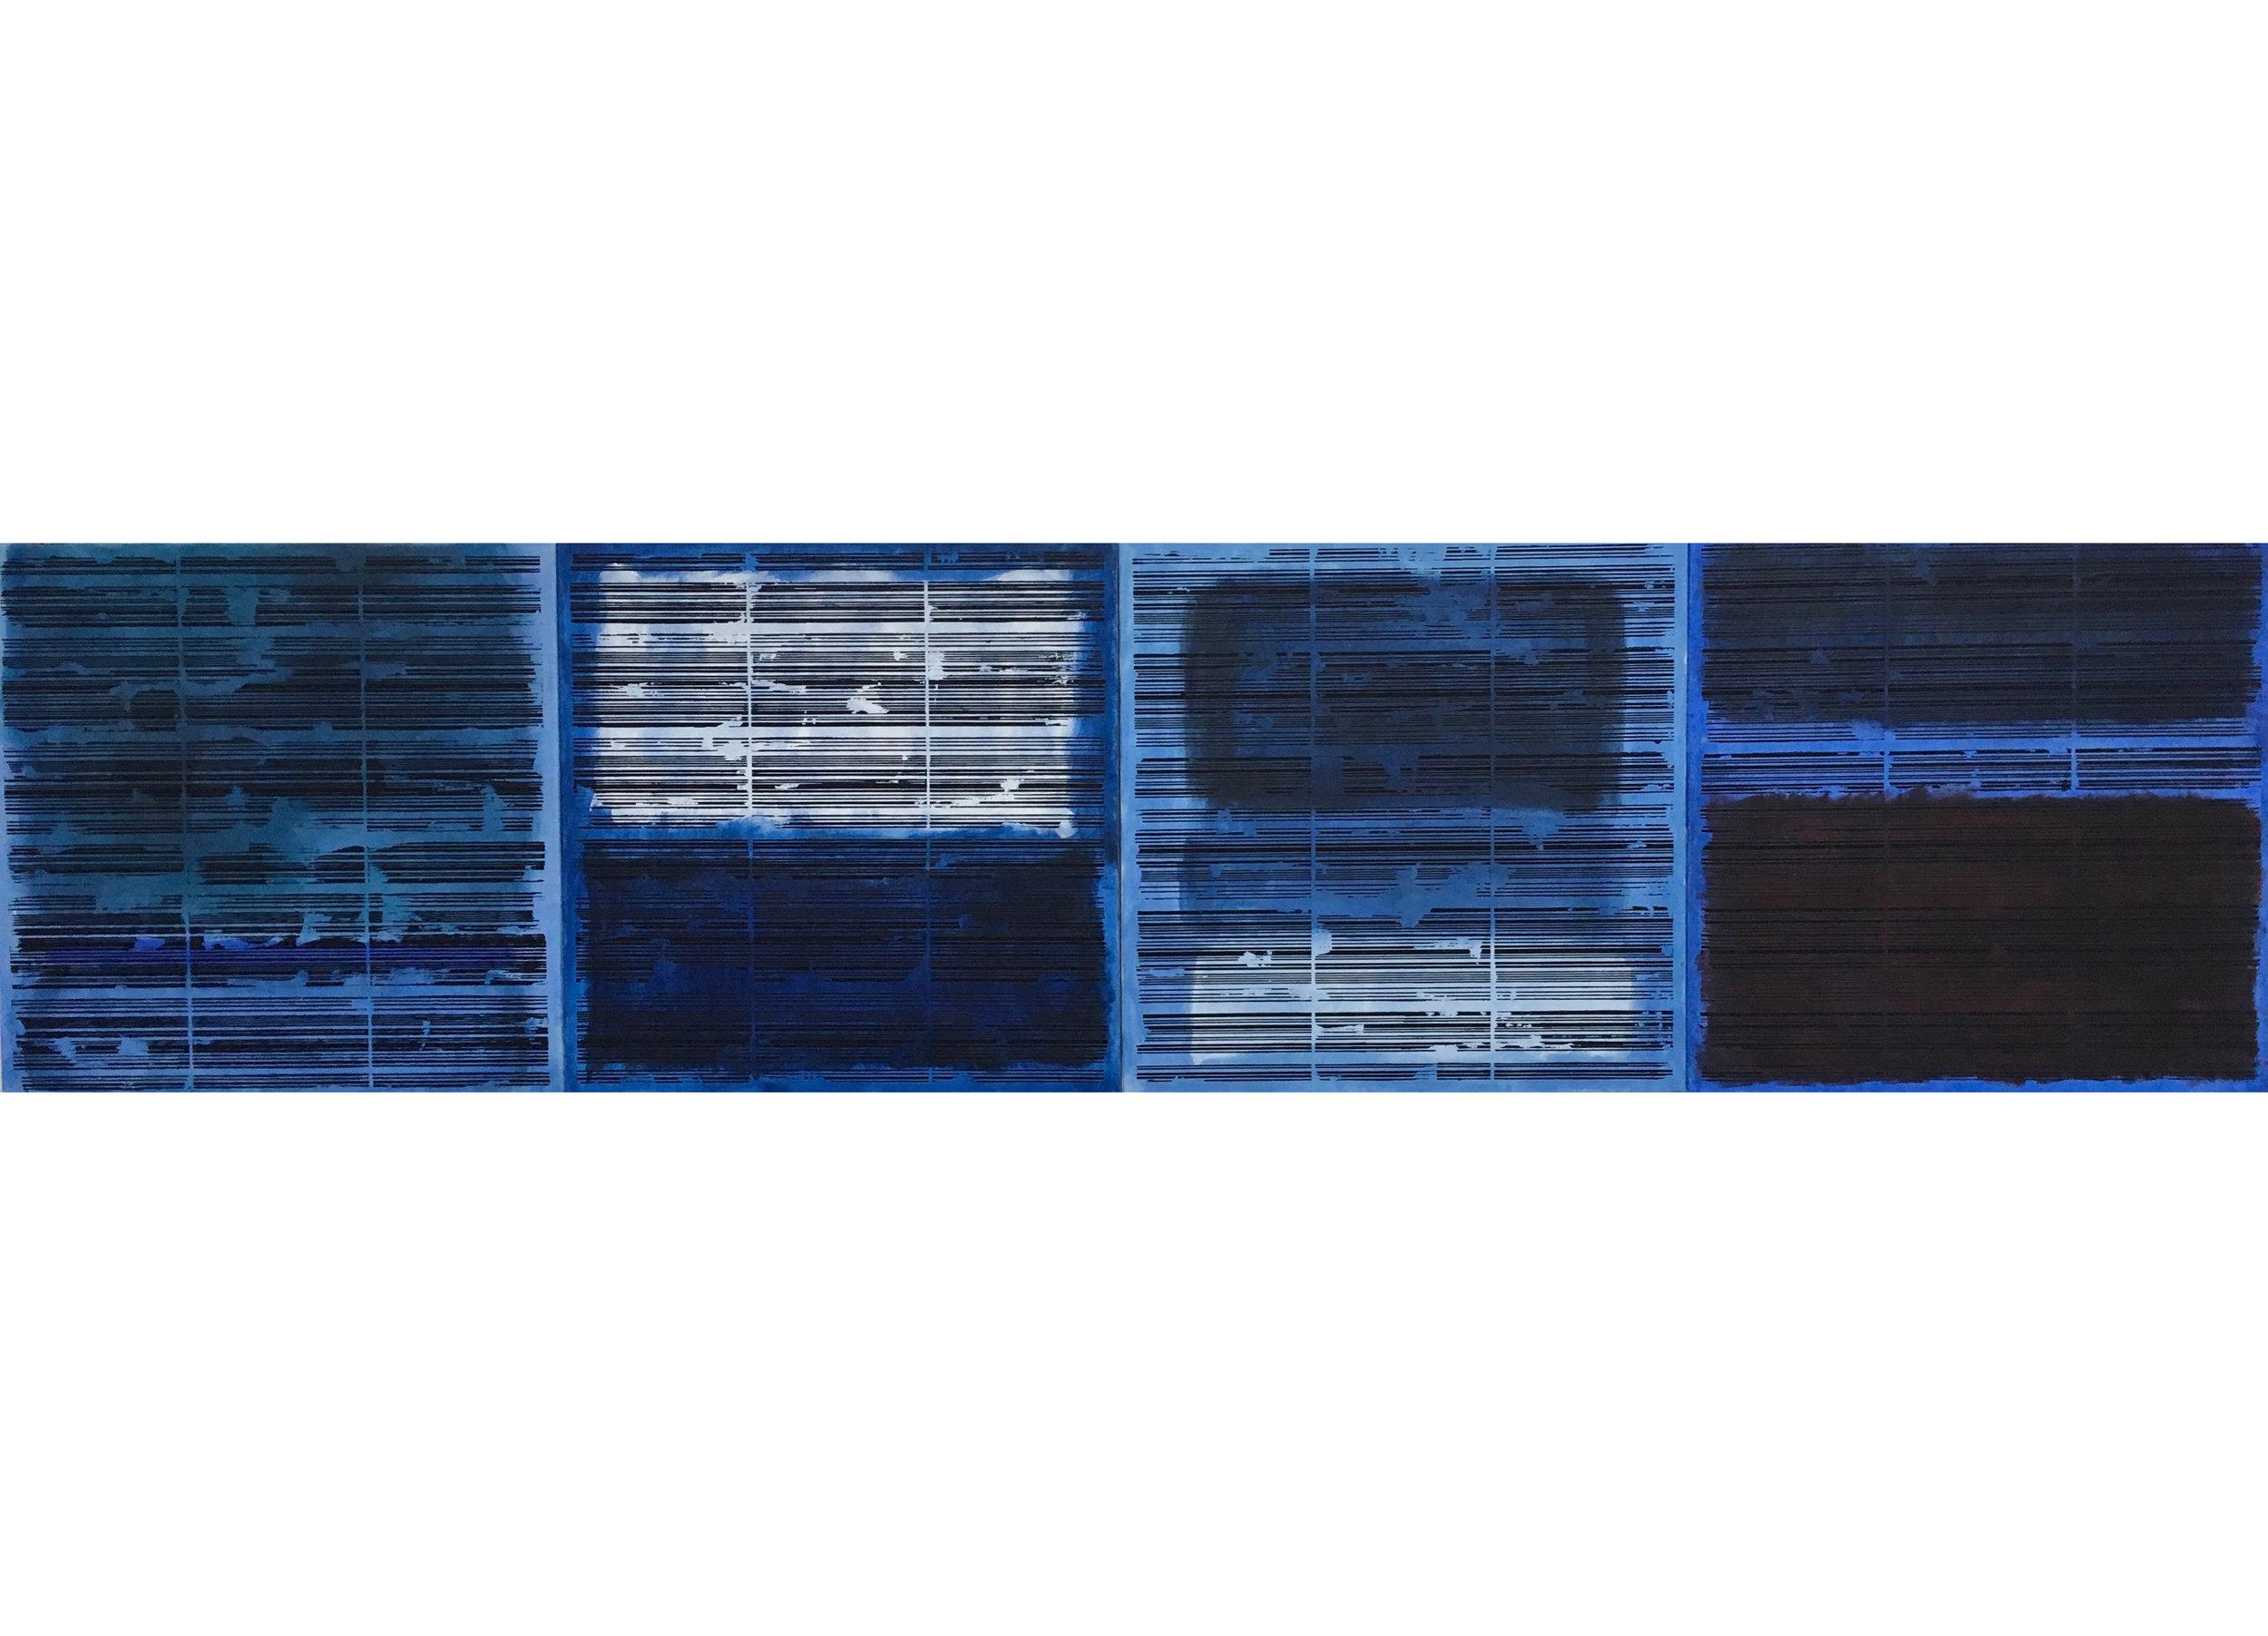 4.Manheimer_Rothko Bar Codes, 2016, 4 panels 24%22x 24%22 each, total dimension 24%22 x 96, acrylic on canvas.jpeg